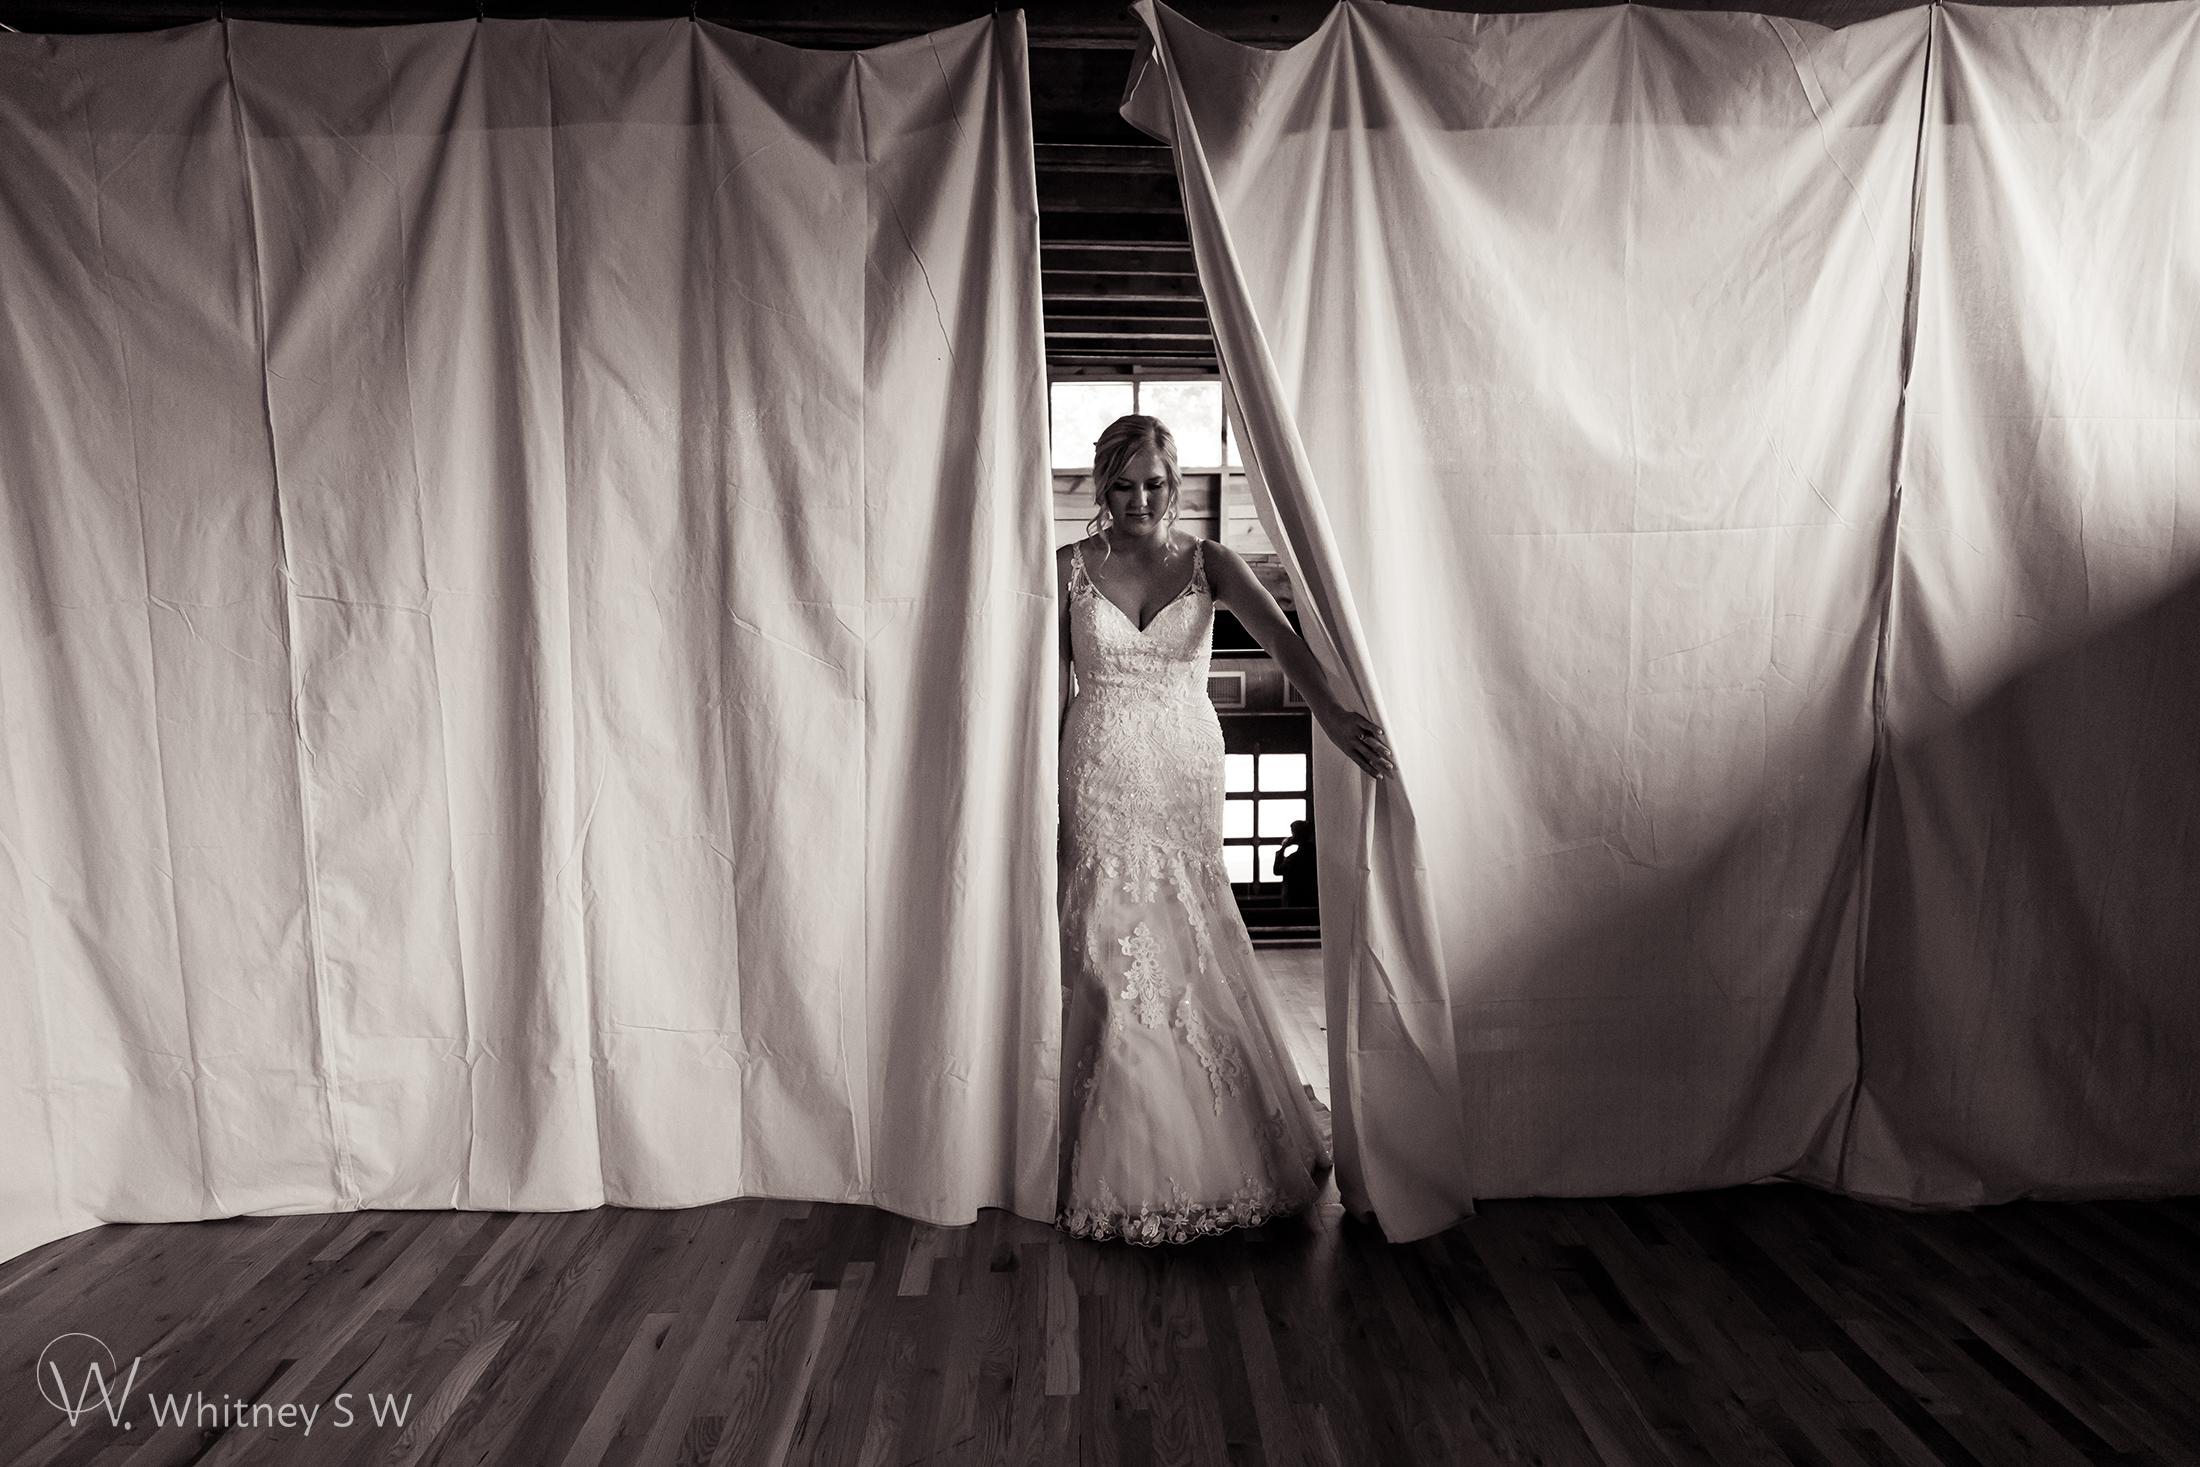 Morgan & Kaivon Wedding - Photography by Whitney S Williams whitneysw (41).jpg